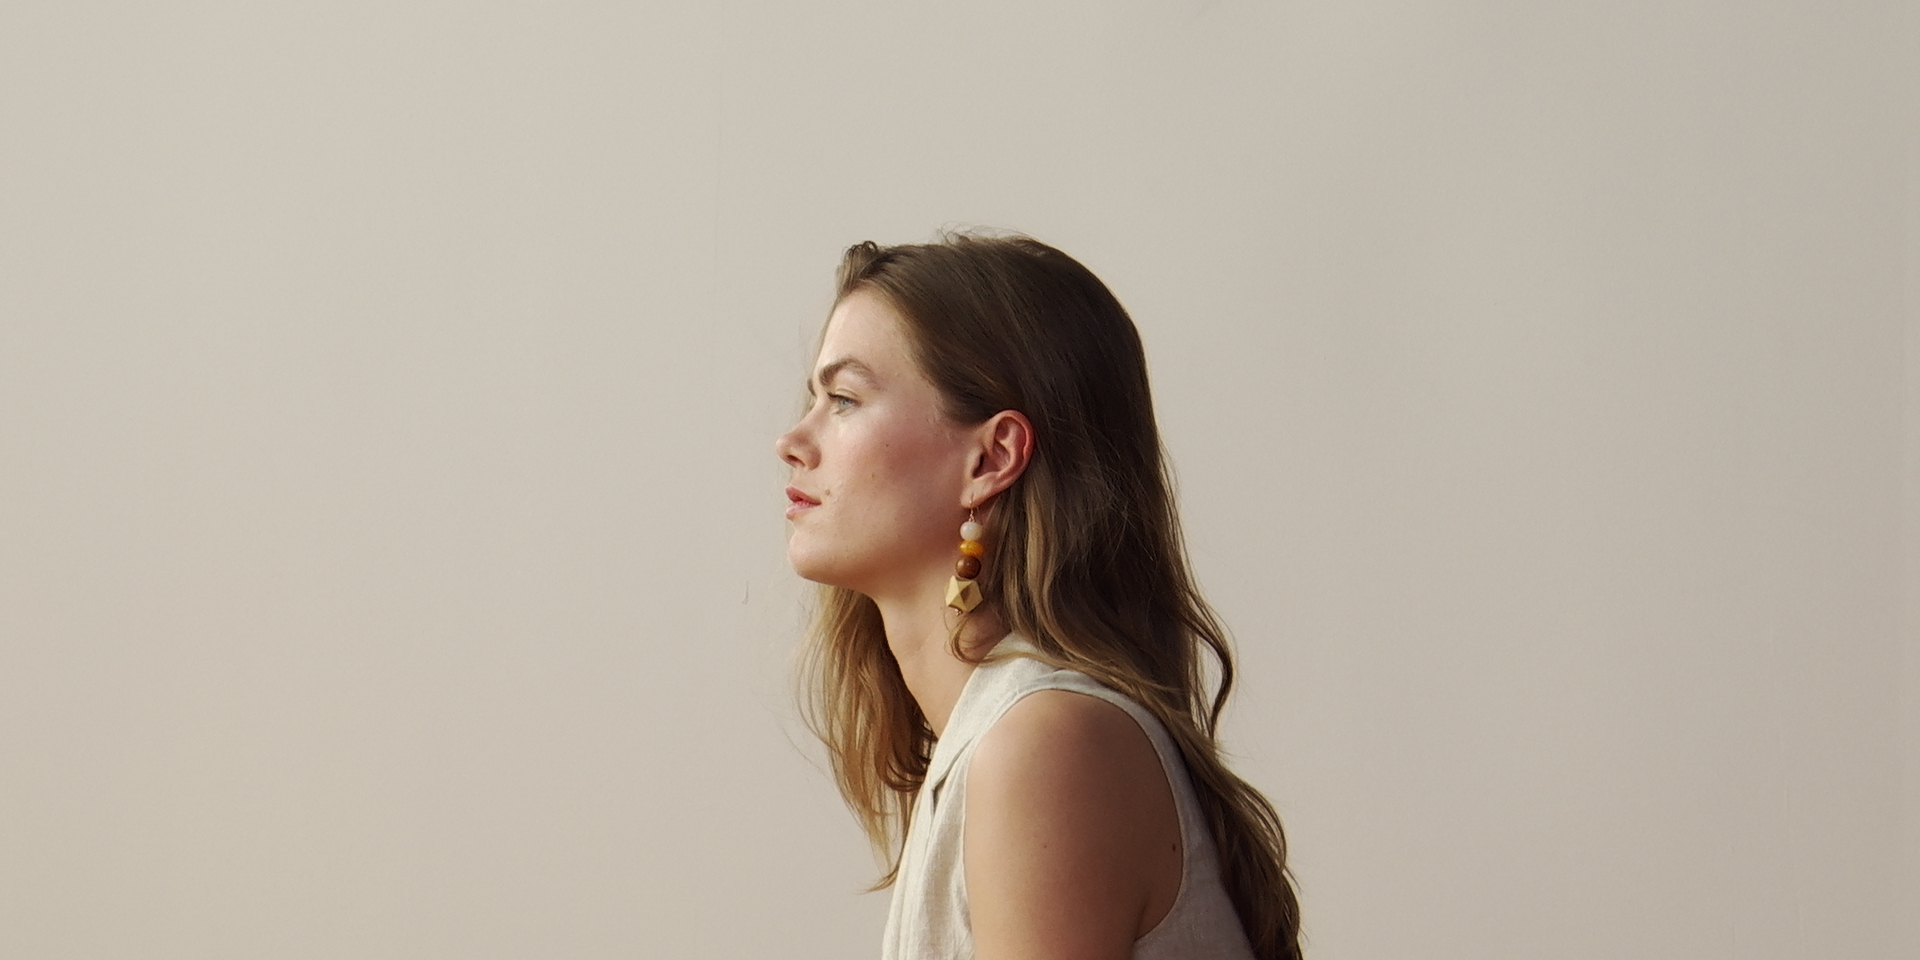 Mango | New Now with Mathilde Brandi